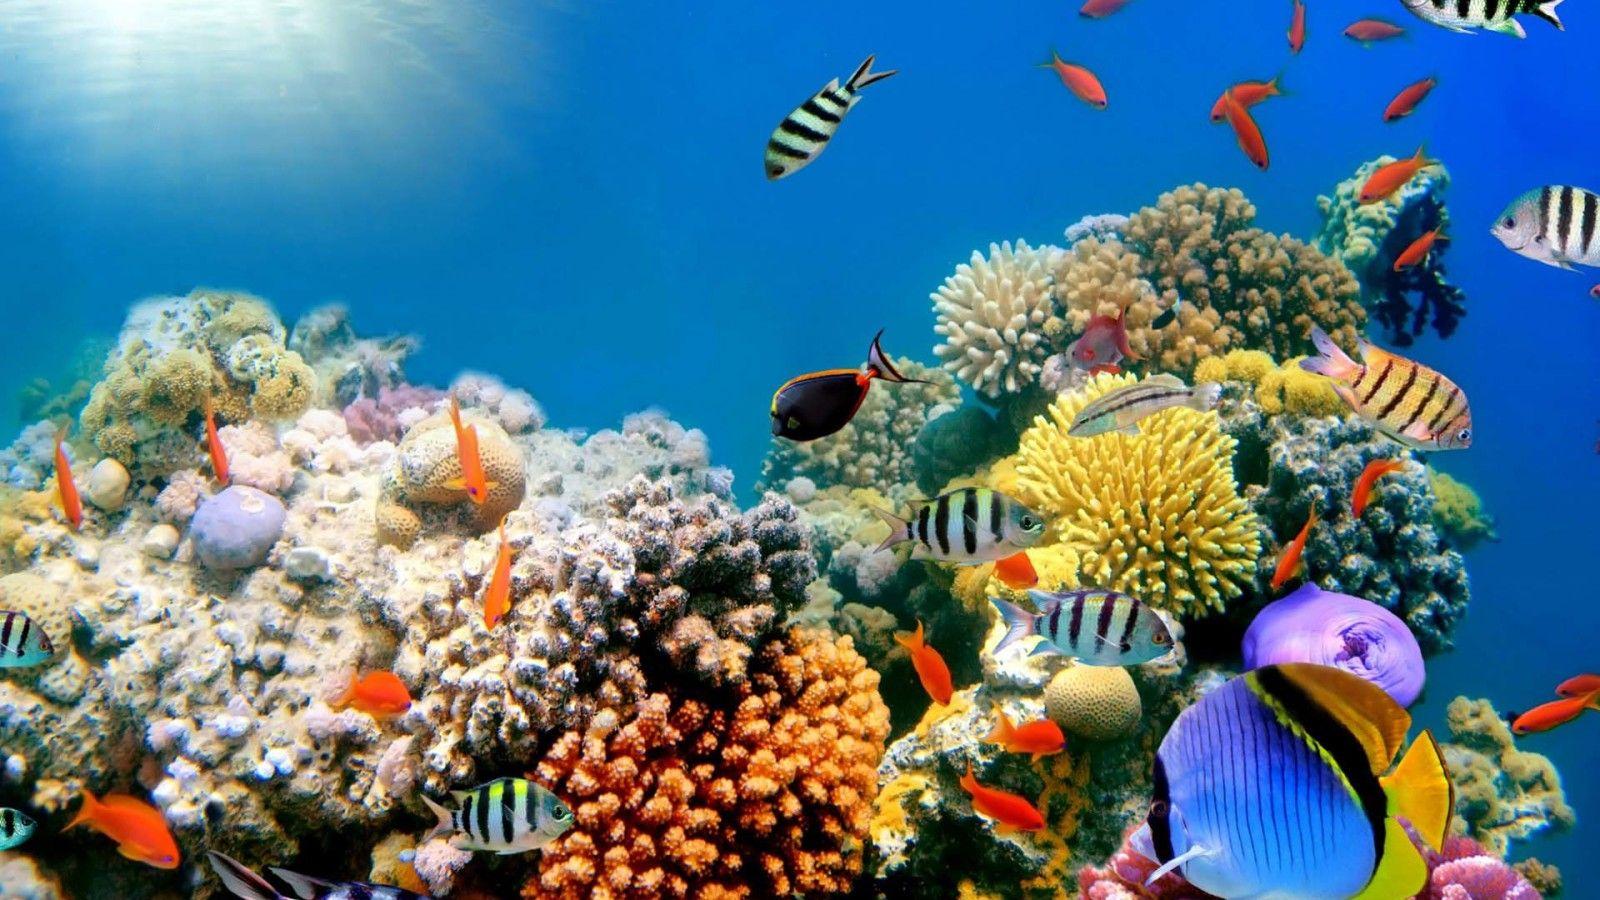 coral reefs wallpapers hd widescreen desktop backgrounds 1600